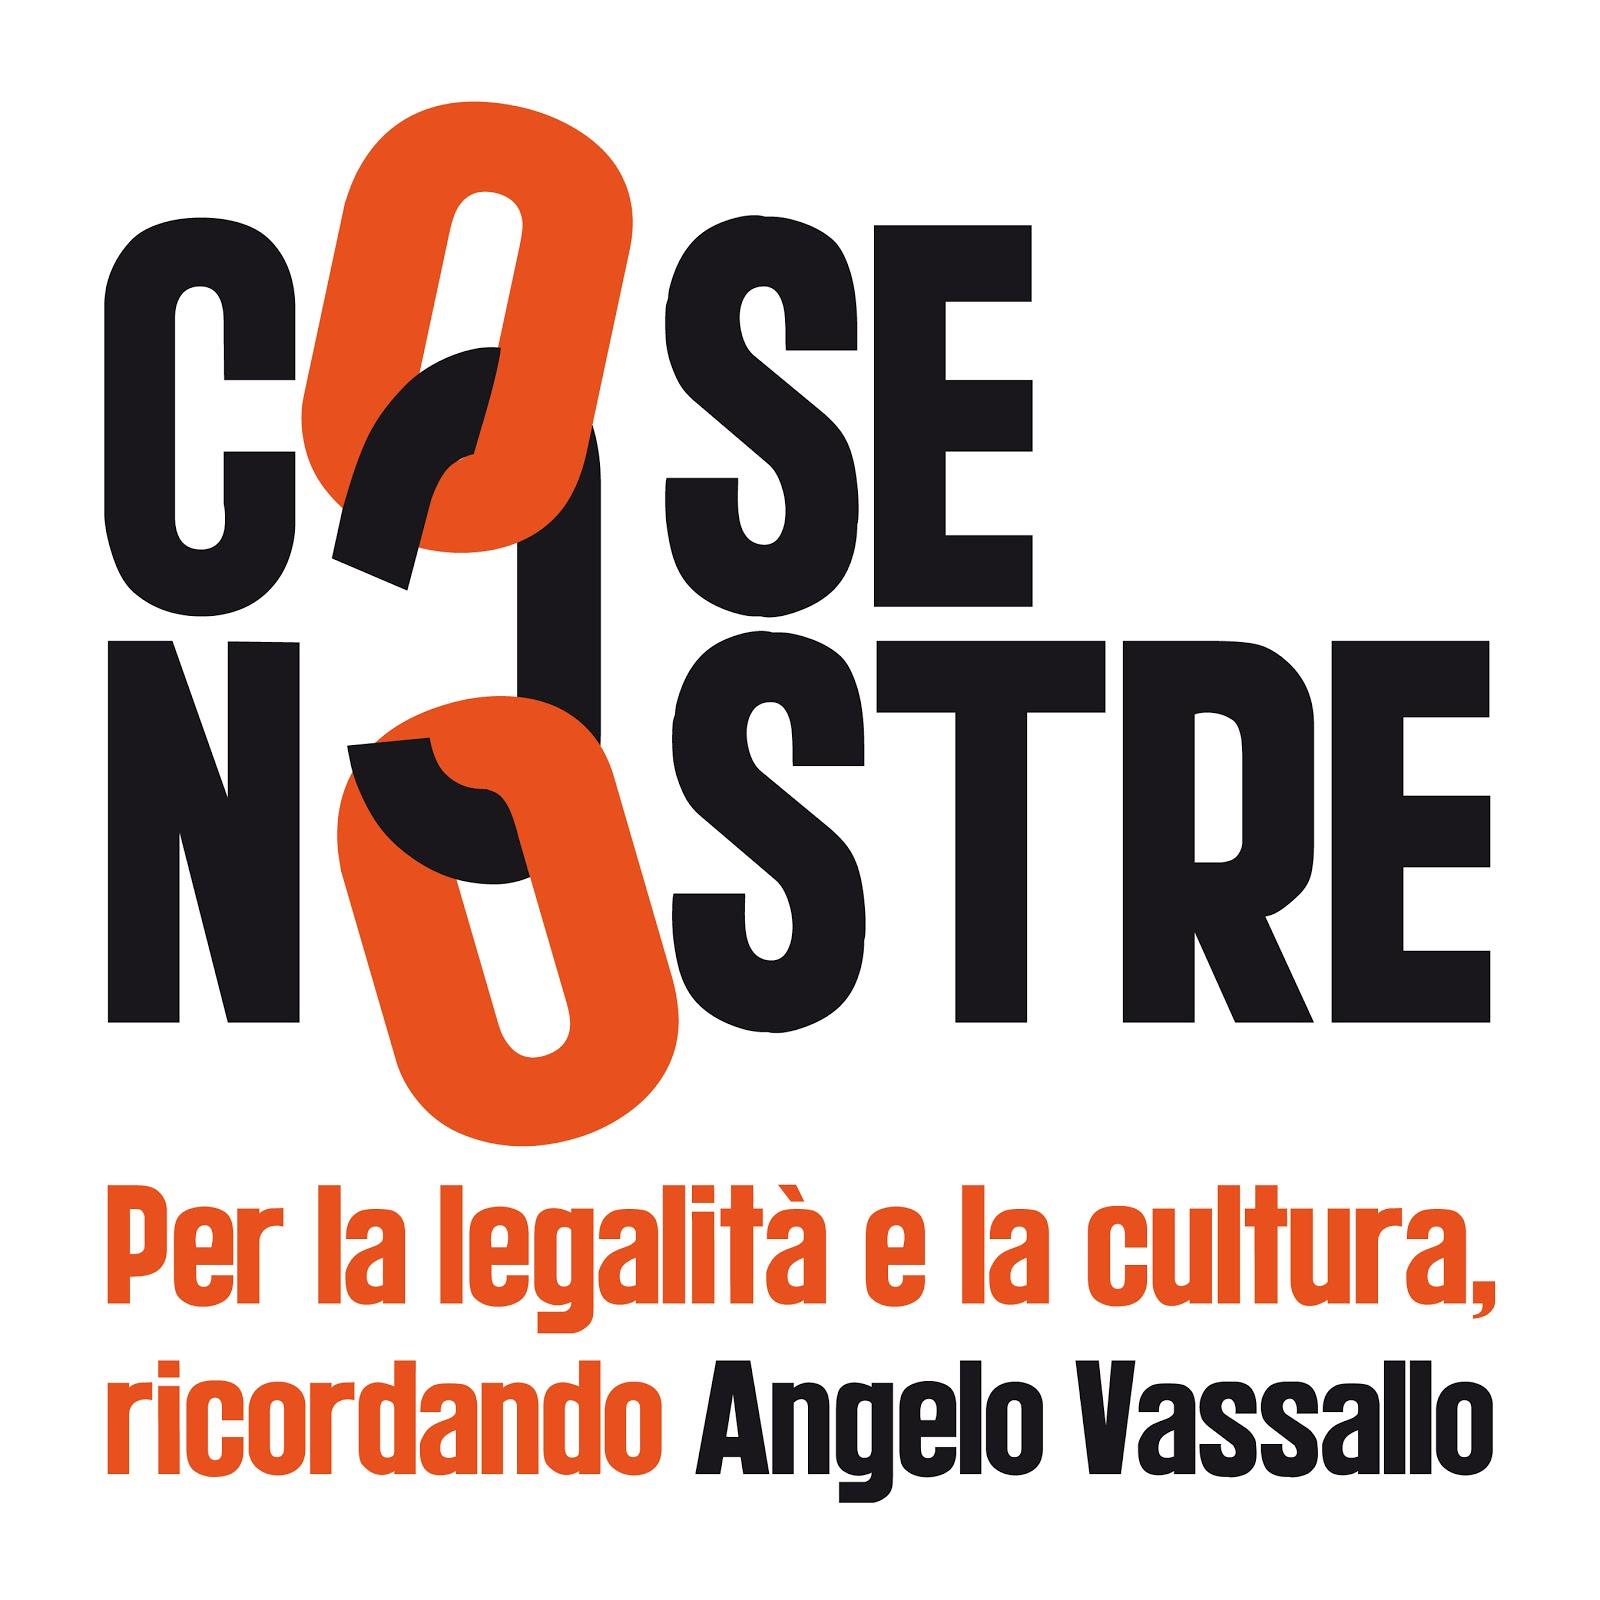 Cose+nostre+logo.jpg